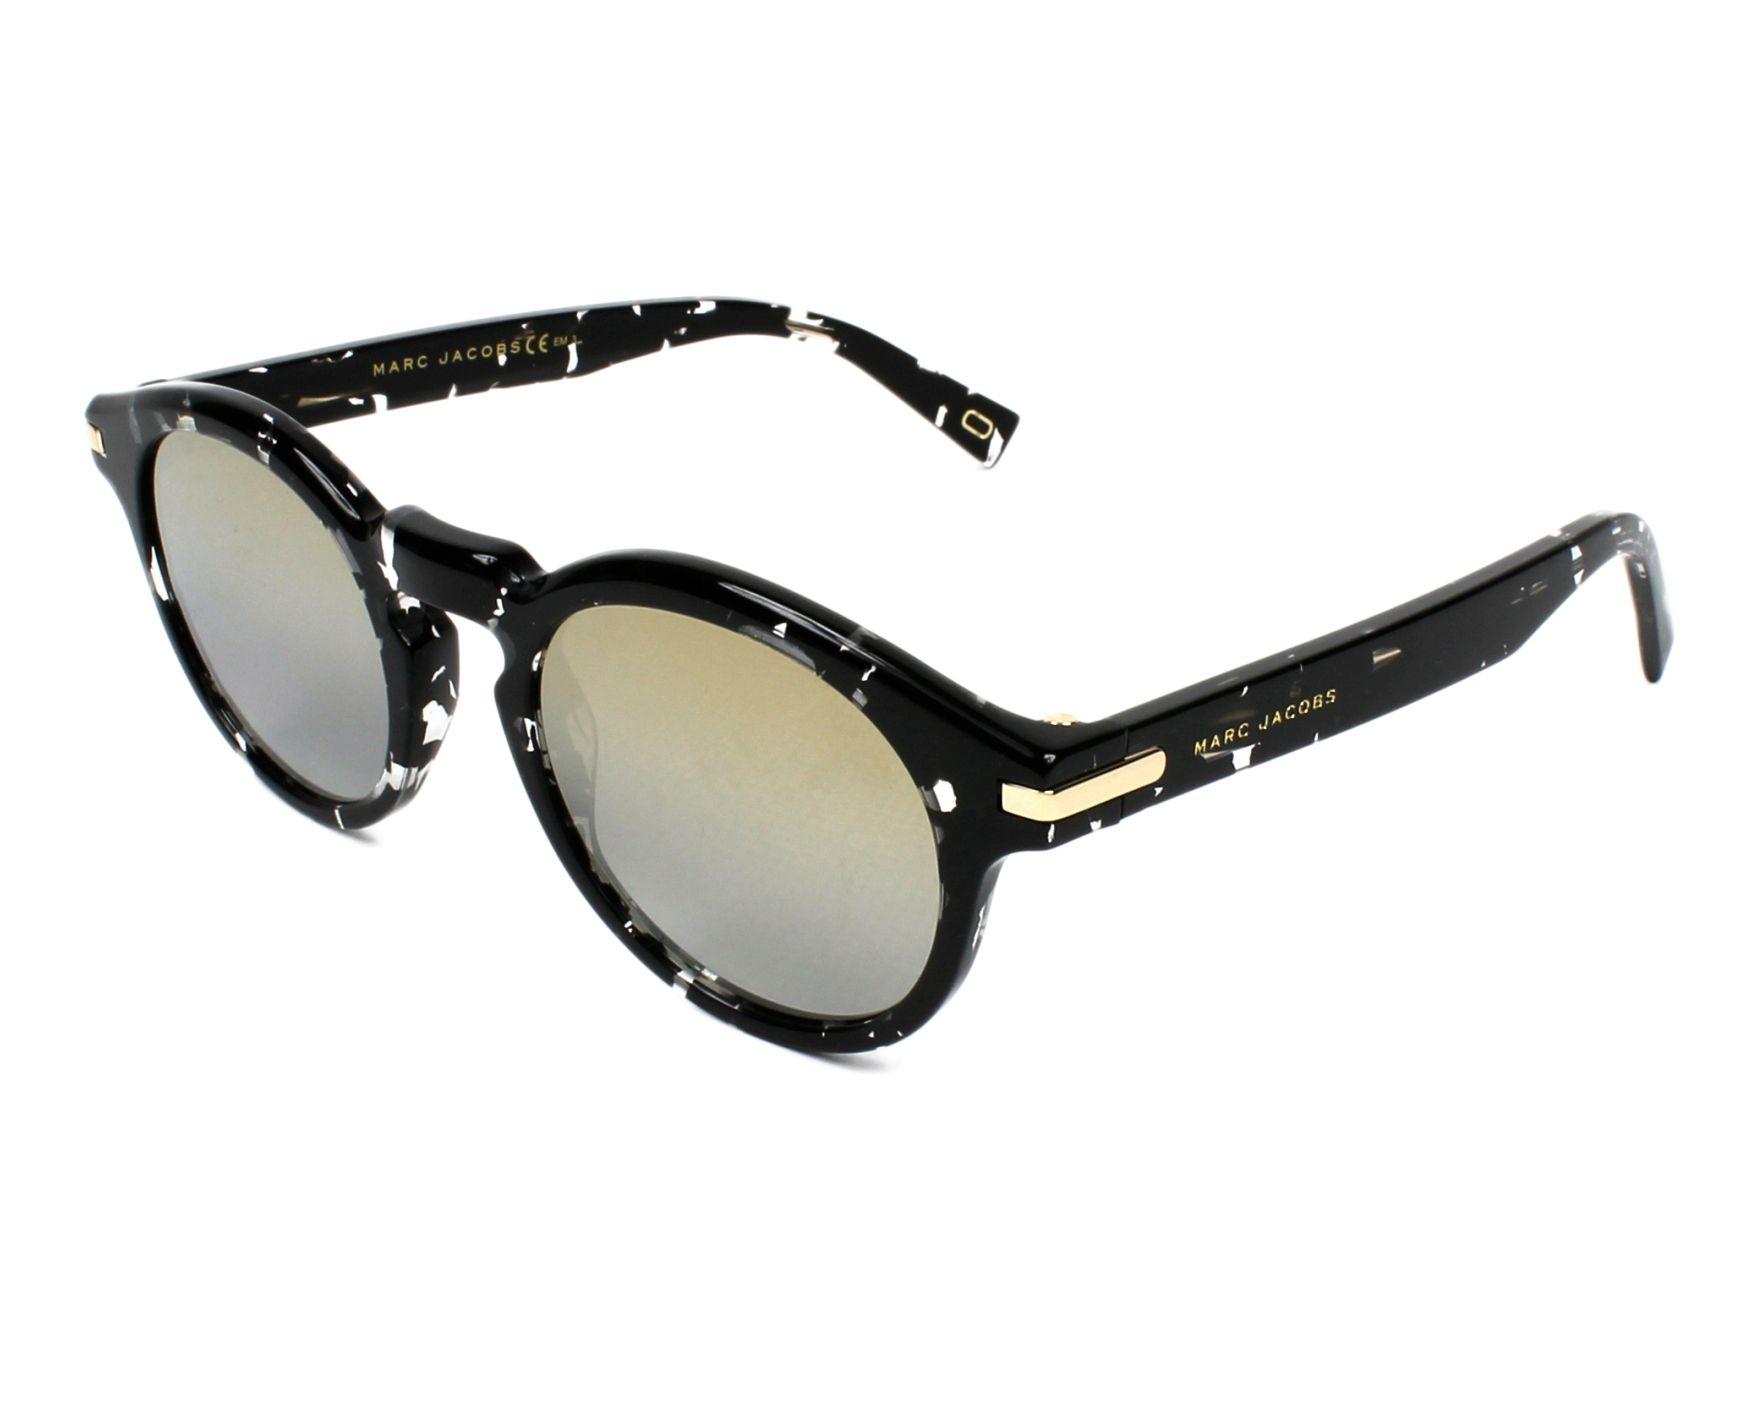 80af4ff1b8e Sunglasses Marc Jacobs MARC-184-S 9WZ 9F 49-22 Black Crystal